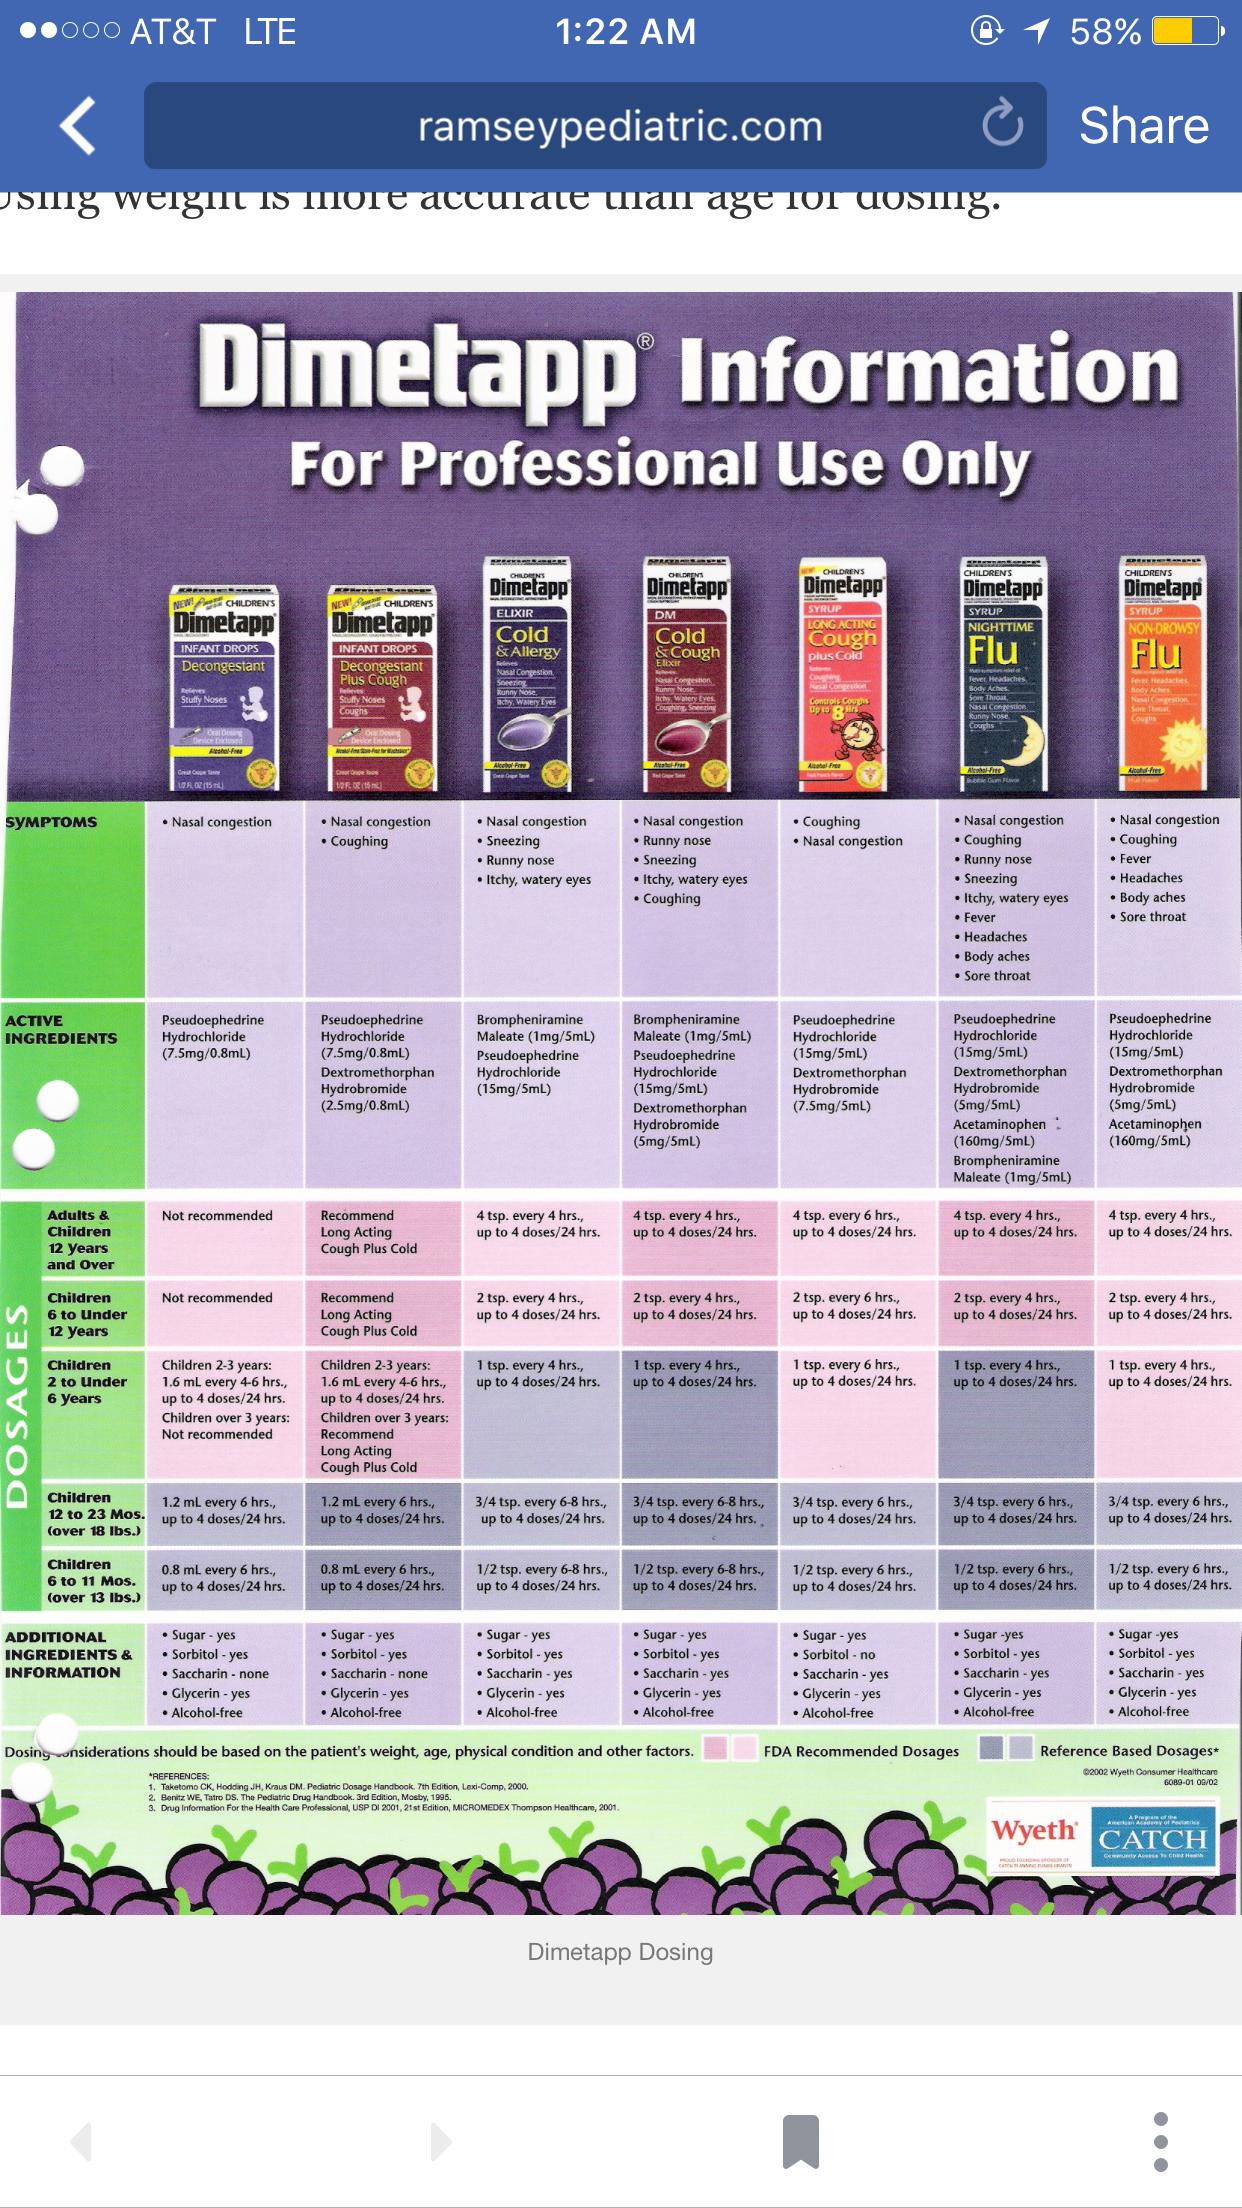 CHILD DOSAGE CHART | Pediatric Doctor Advise